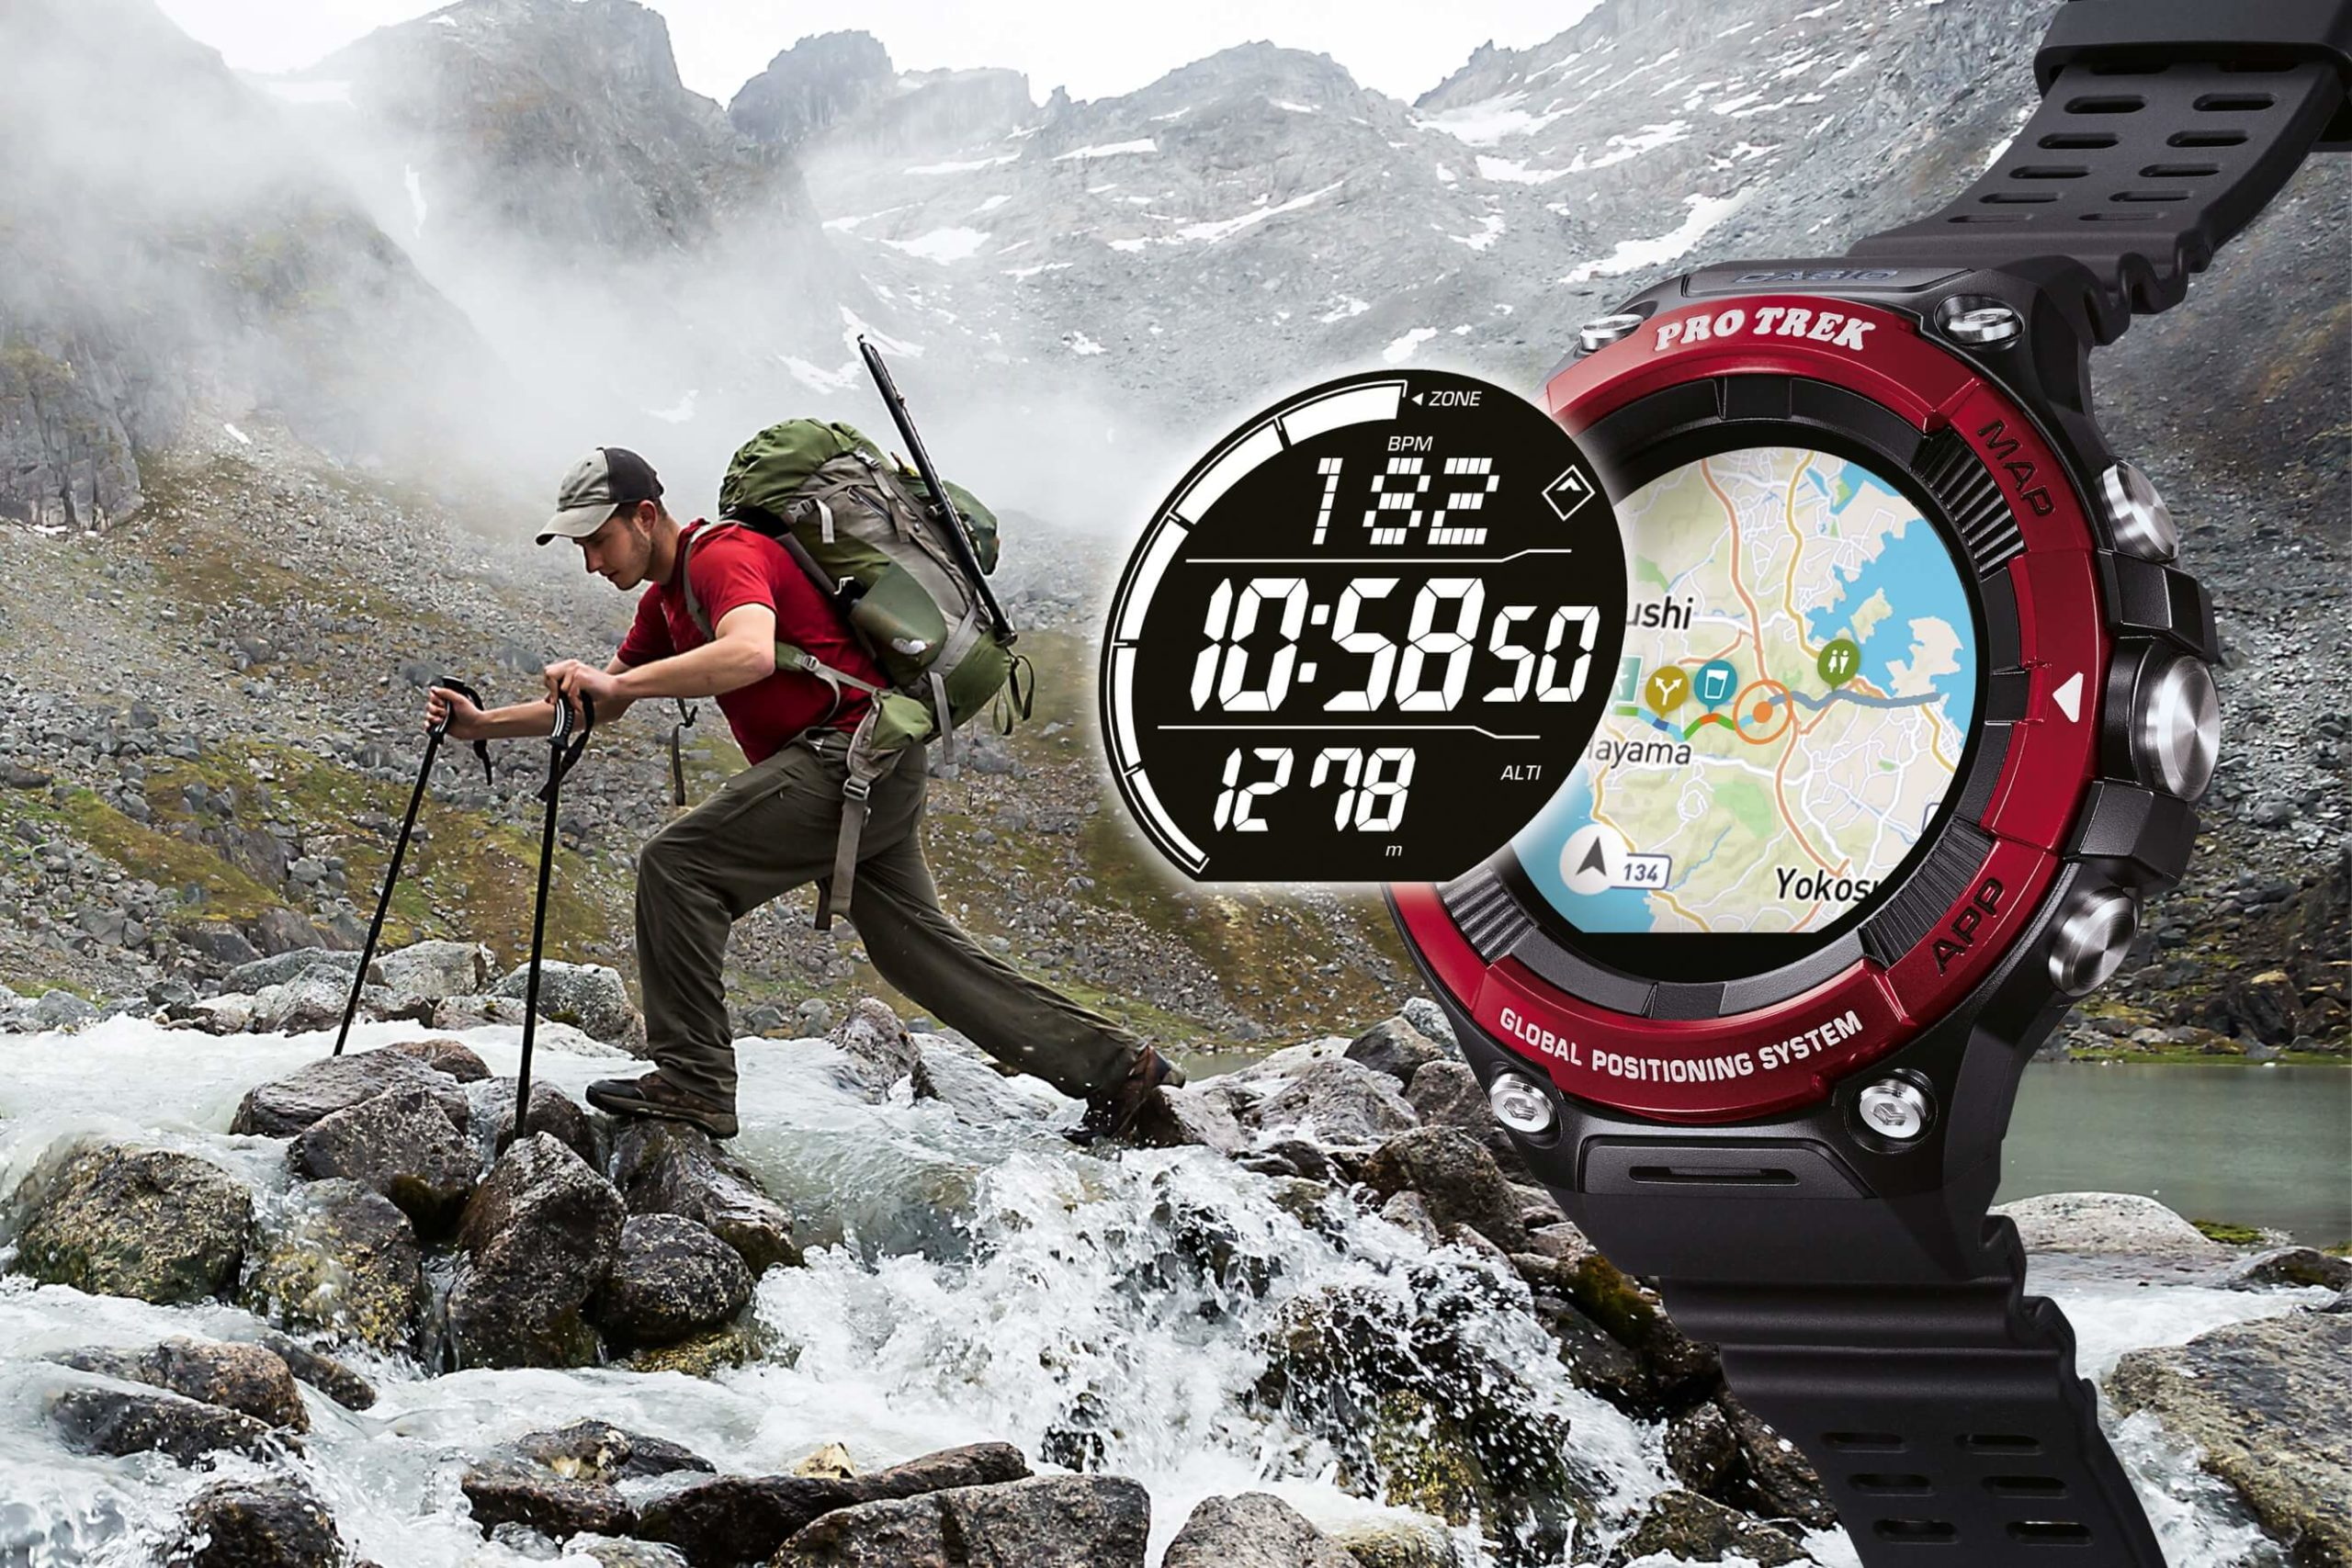 Tested by CAMPZ - Casio Pro Trek Smartwatch